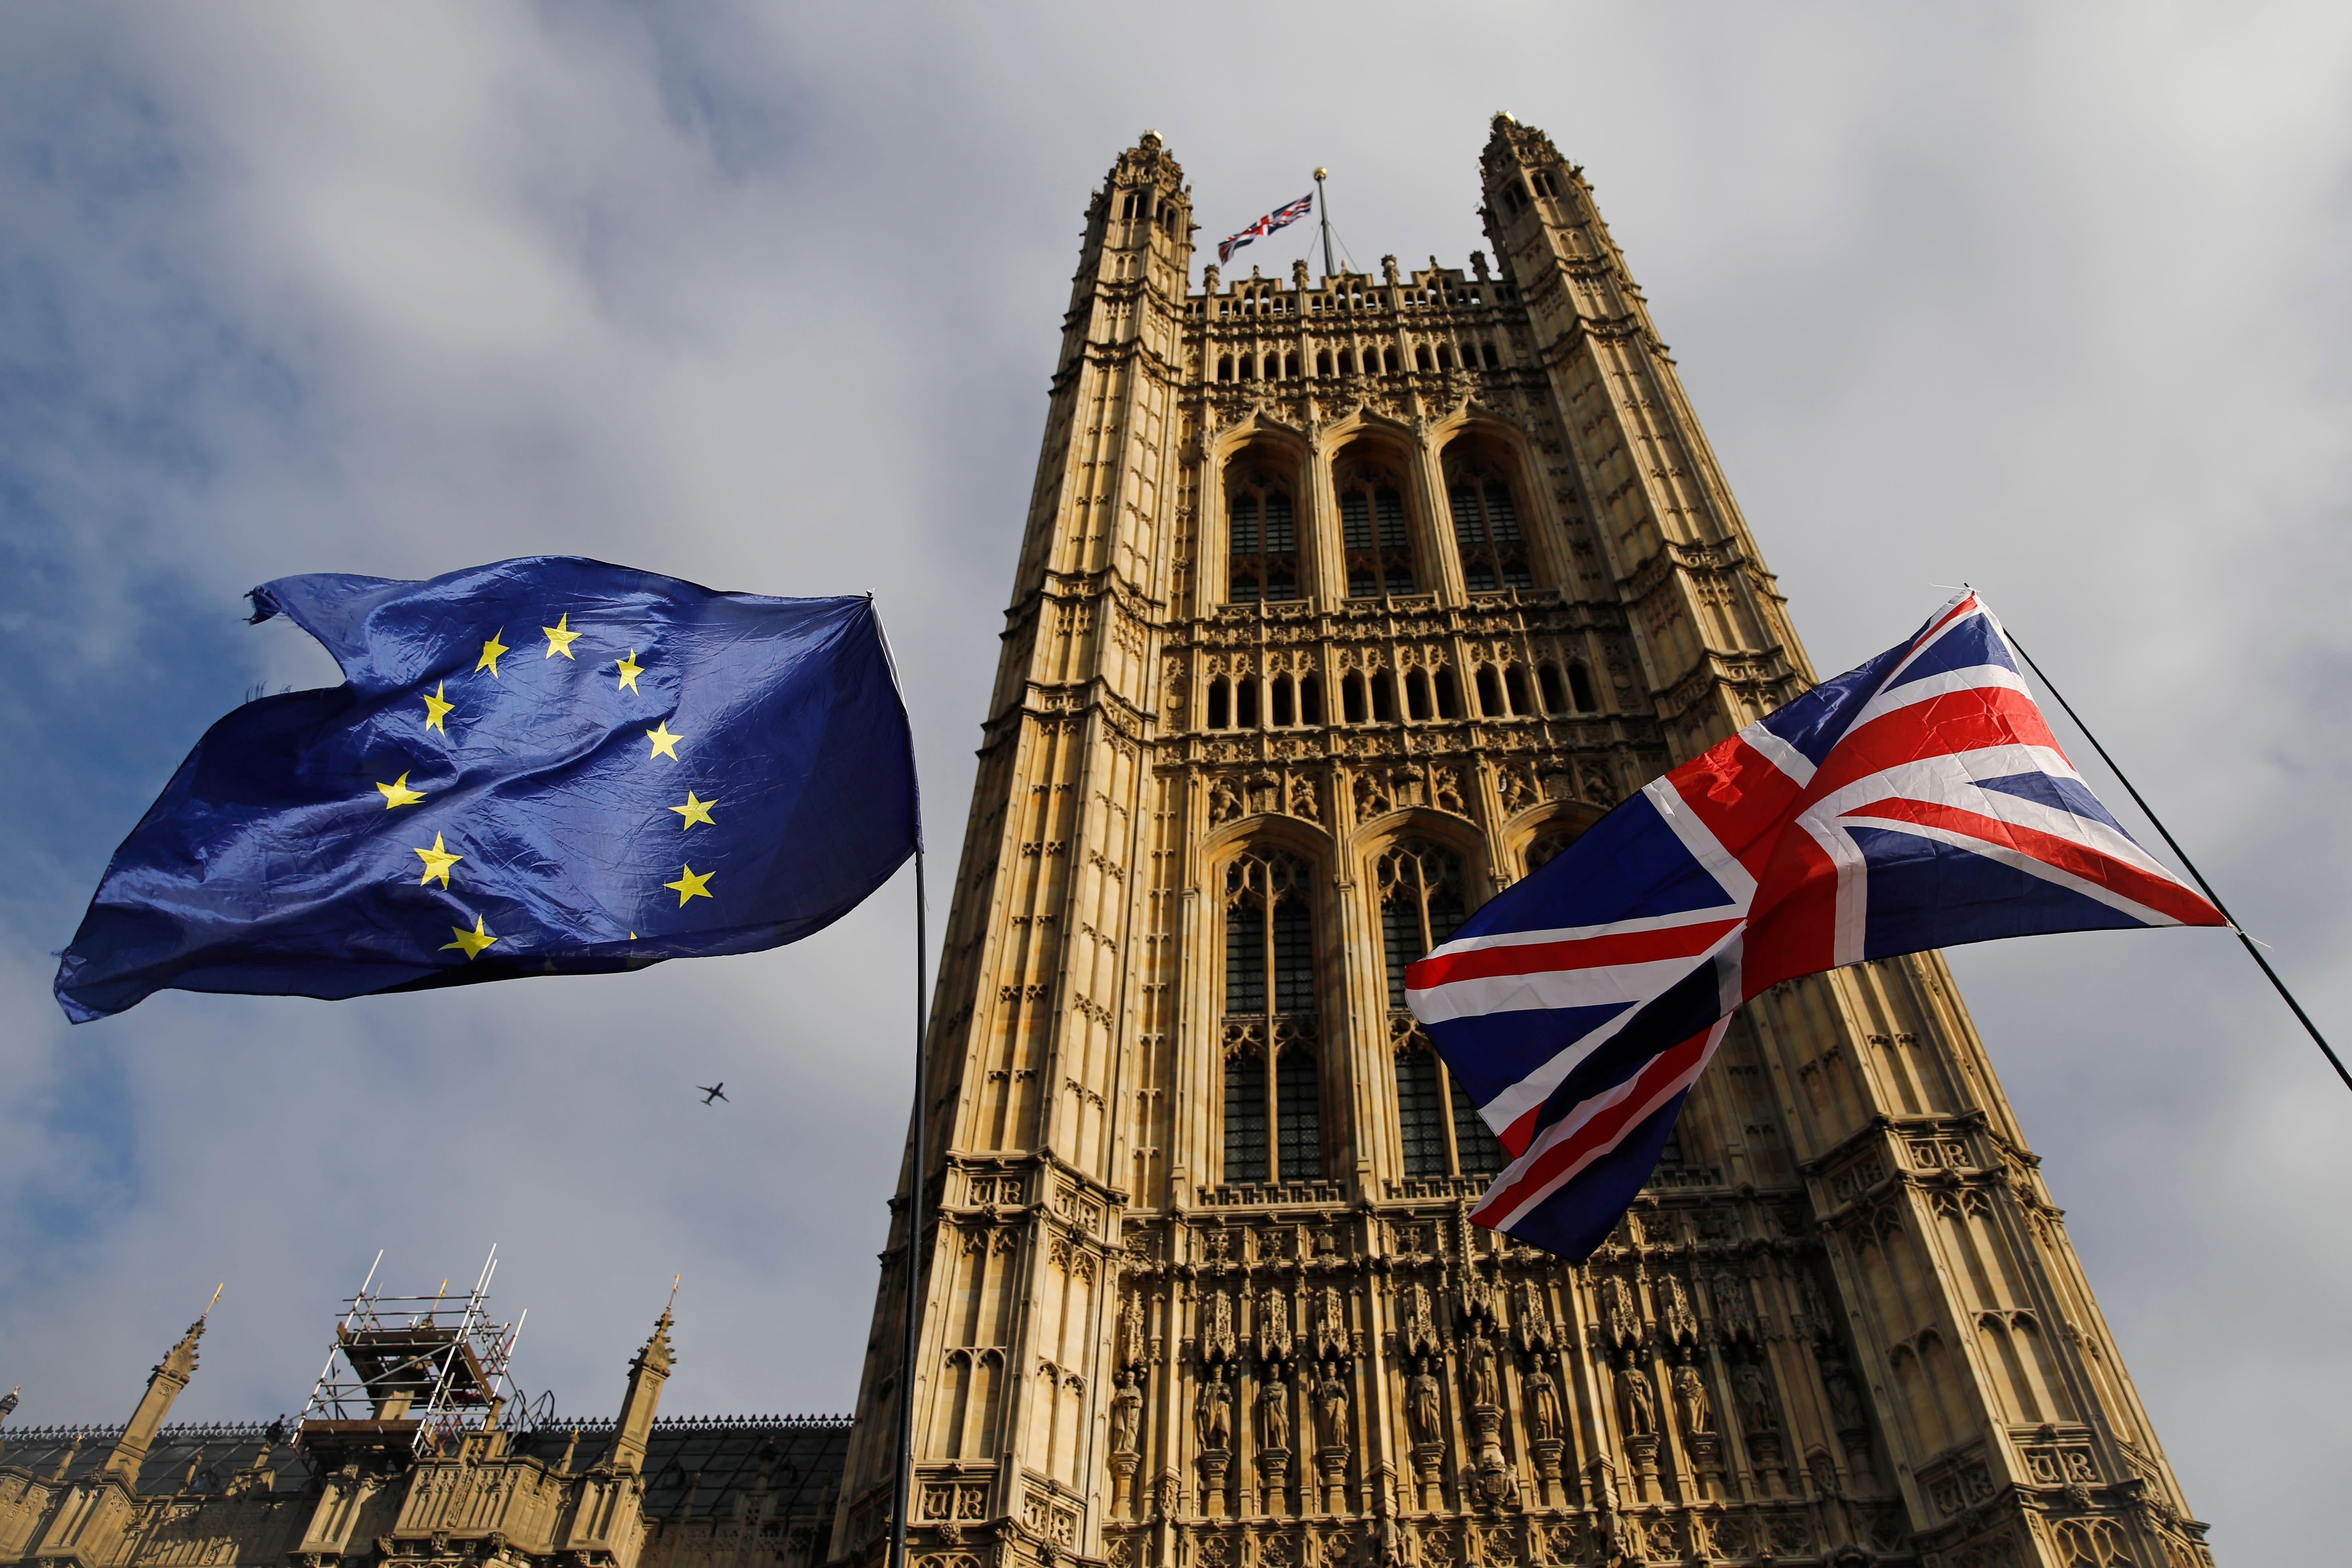 Majority of voters believe Brexit referendum 'should never have been called'